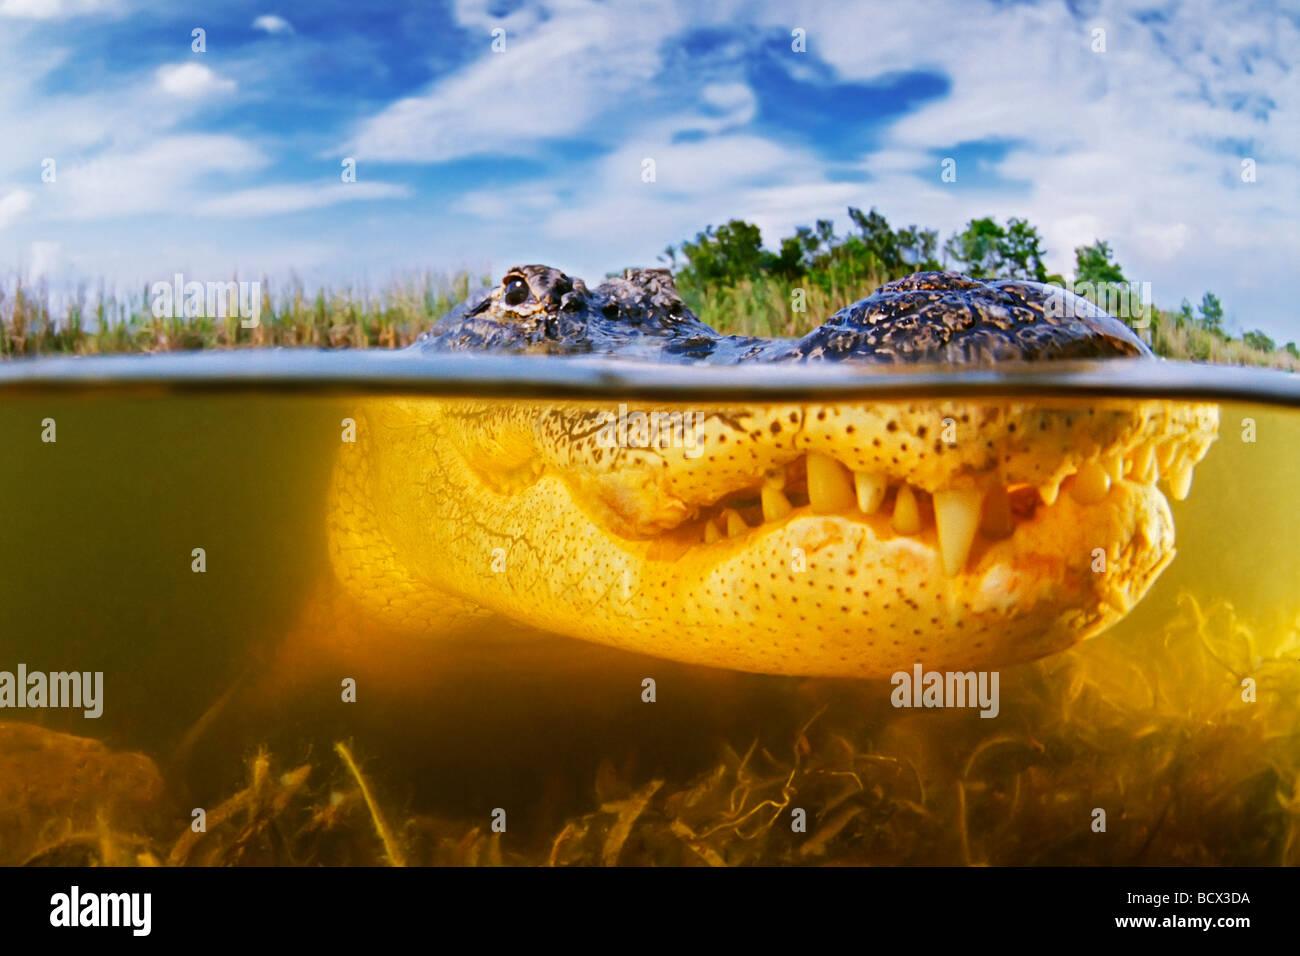 Amerikanischer Alligator Alligator Mississipiensis Everglades Nationalpark Florida USA Stockbild